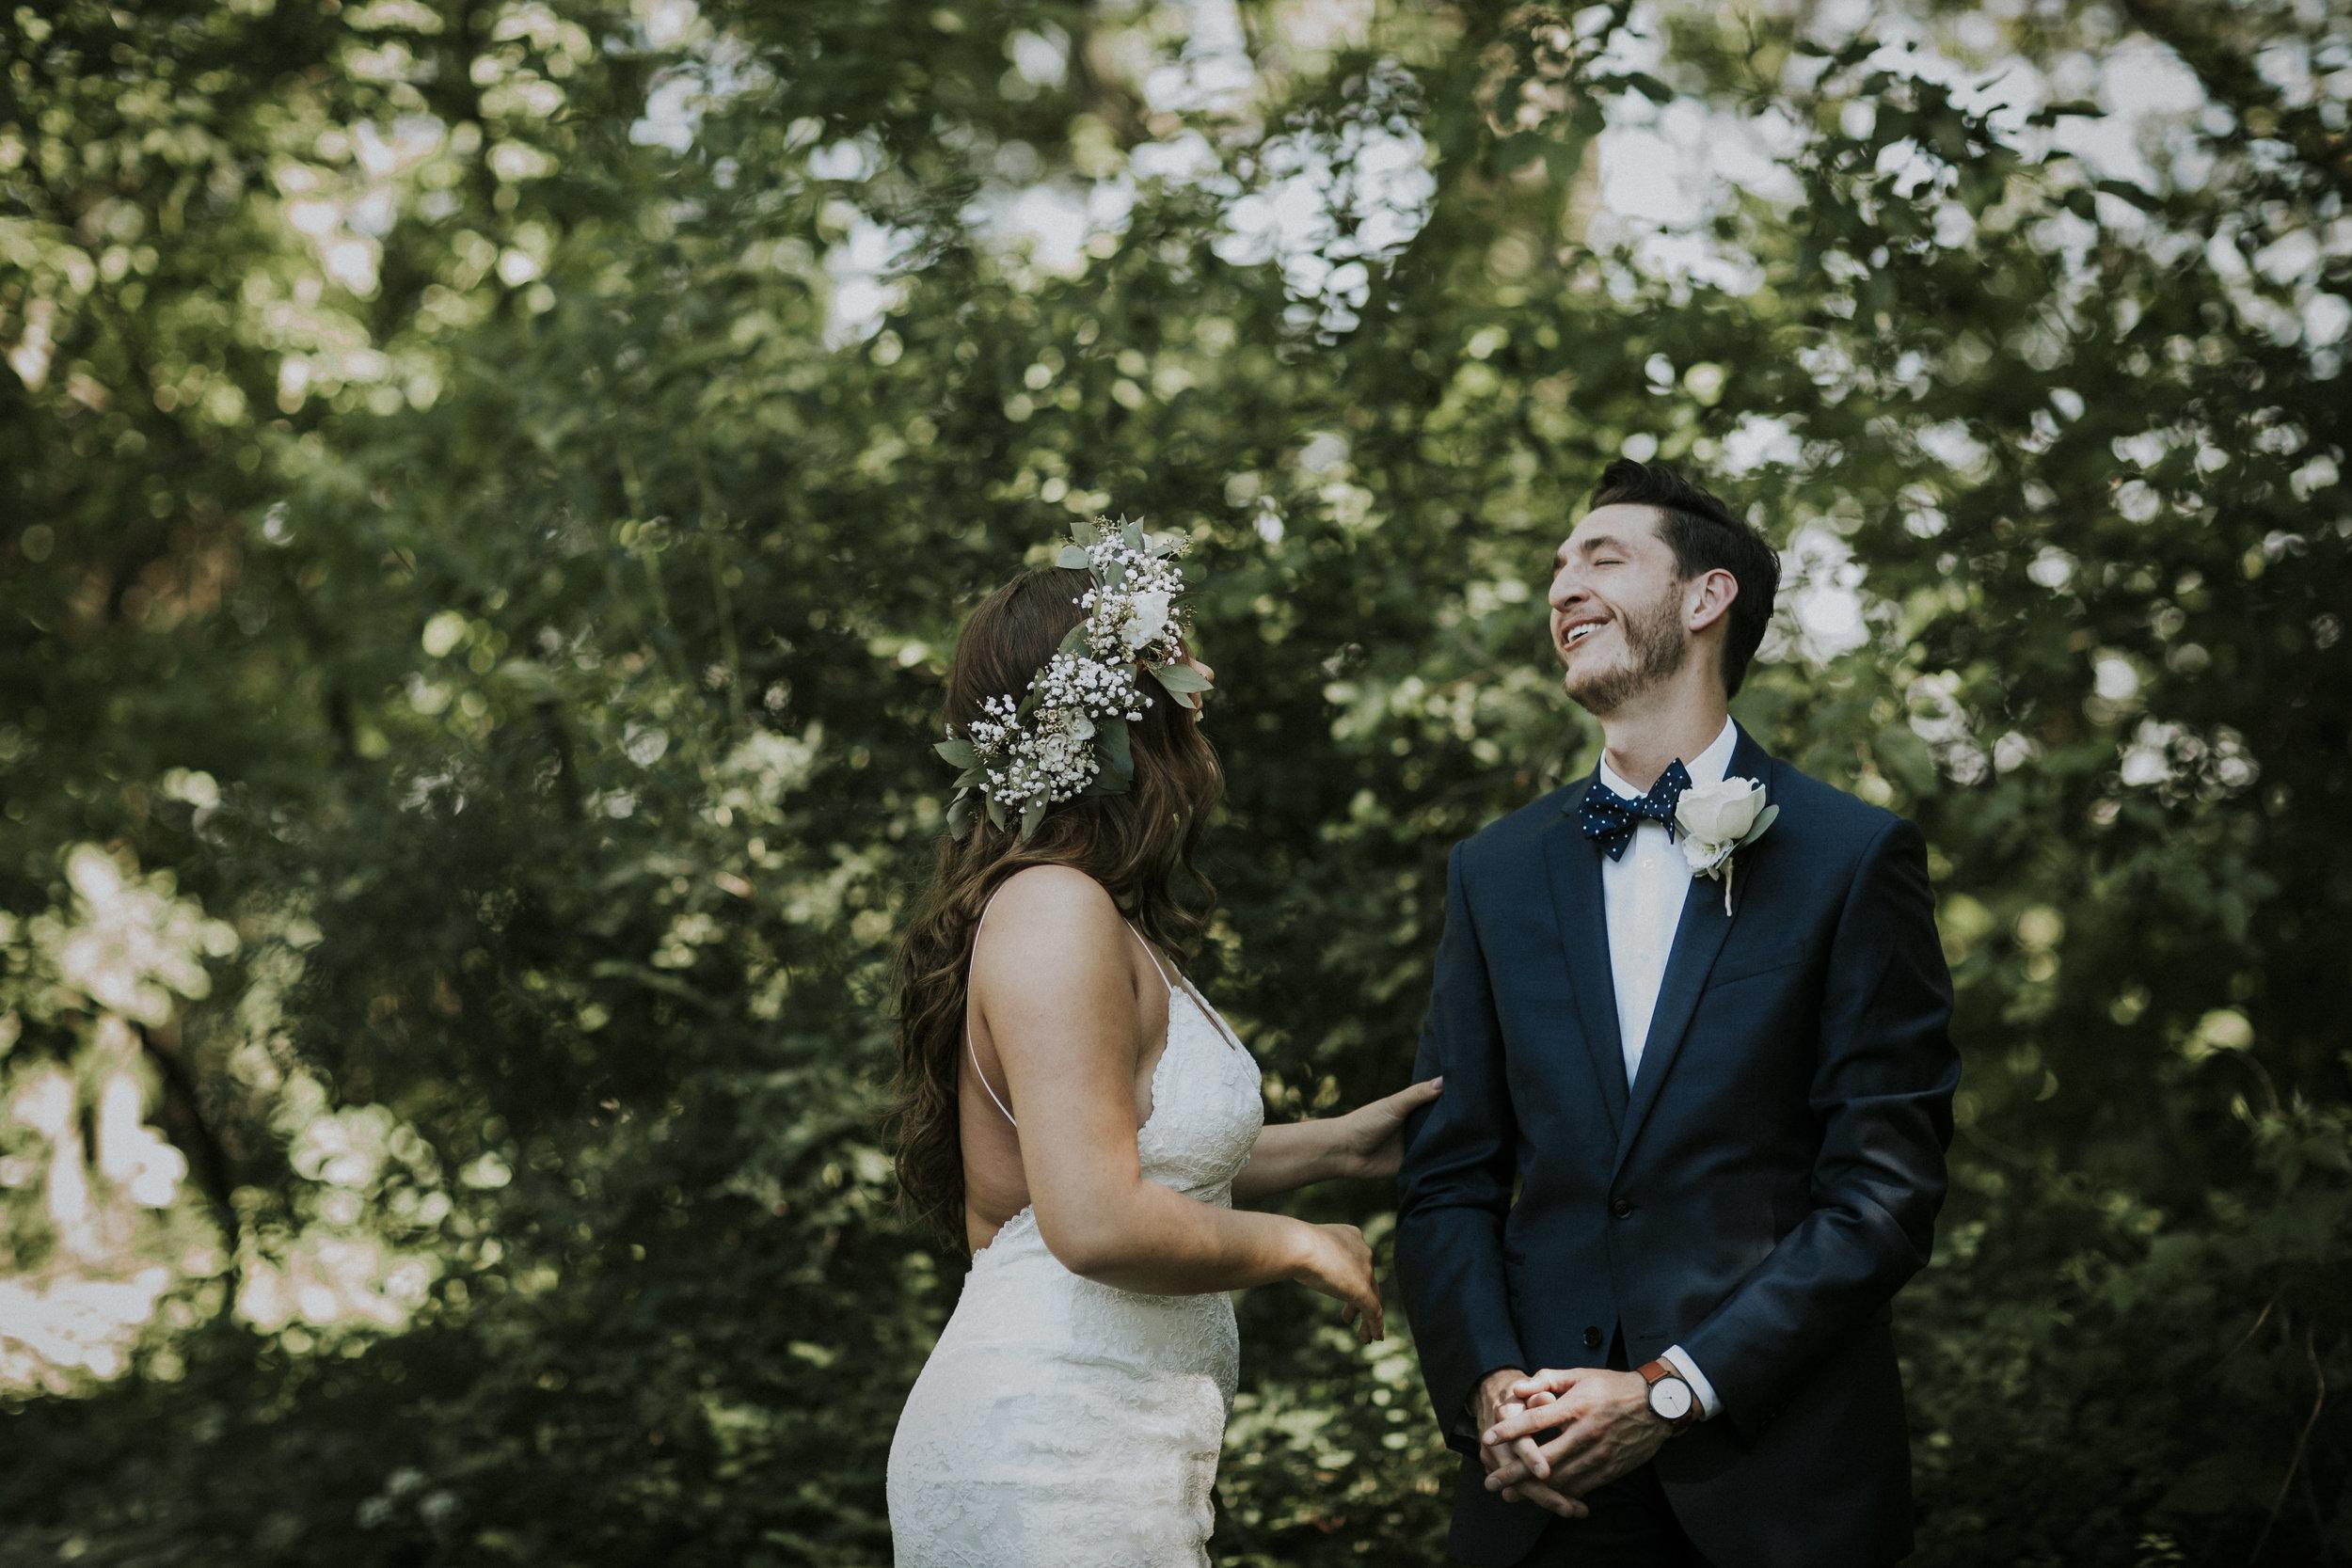 Courtney+Lawrence_Wedding_285.jpg